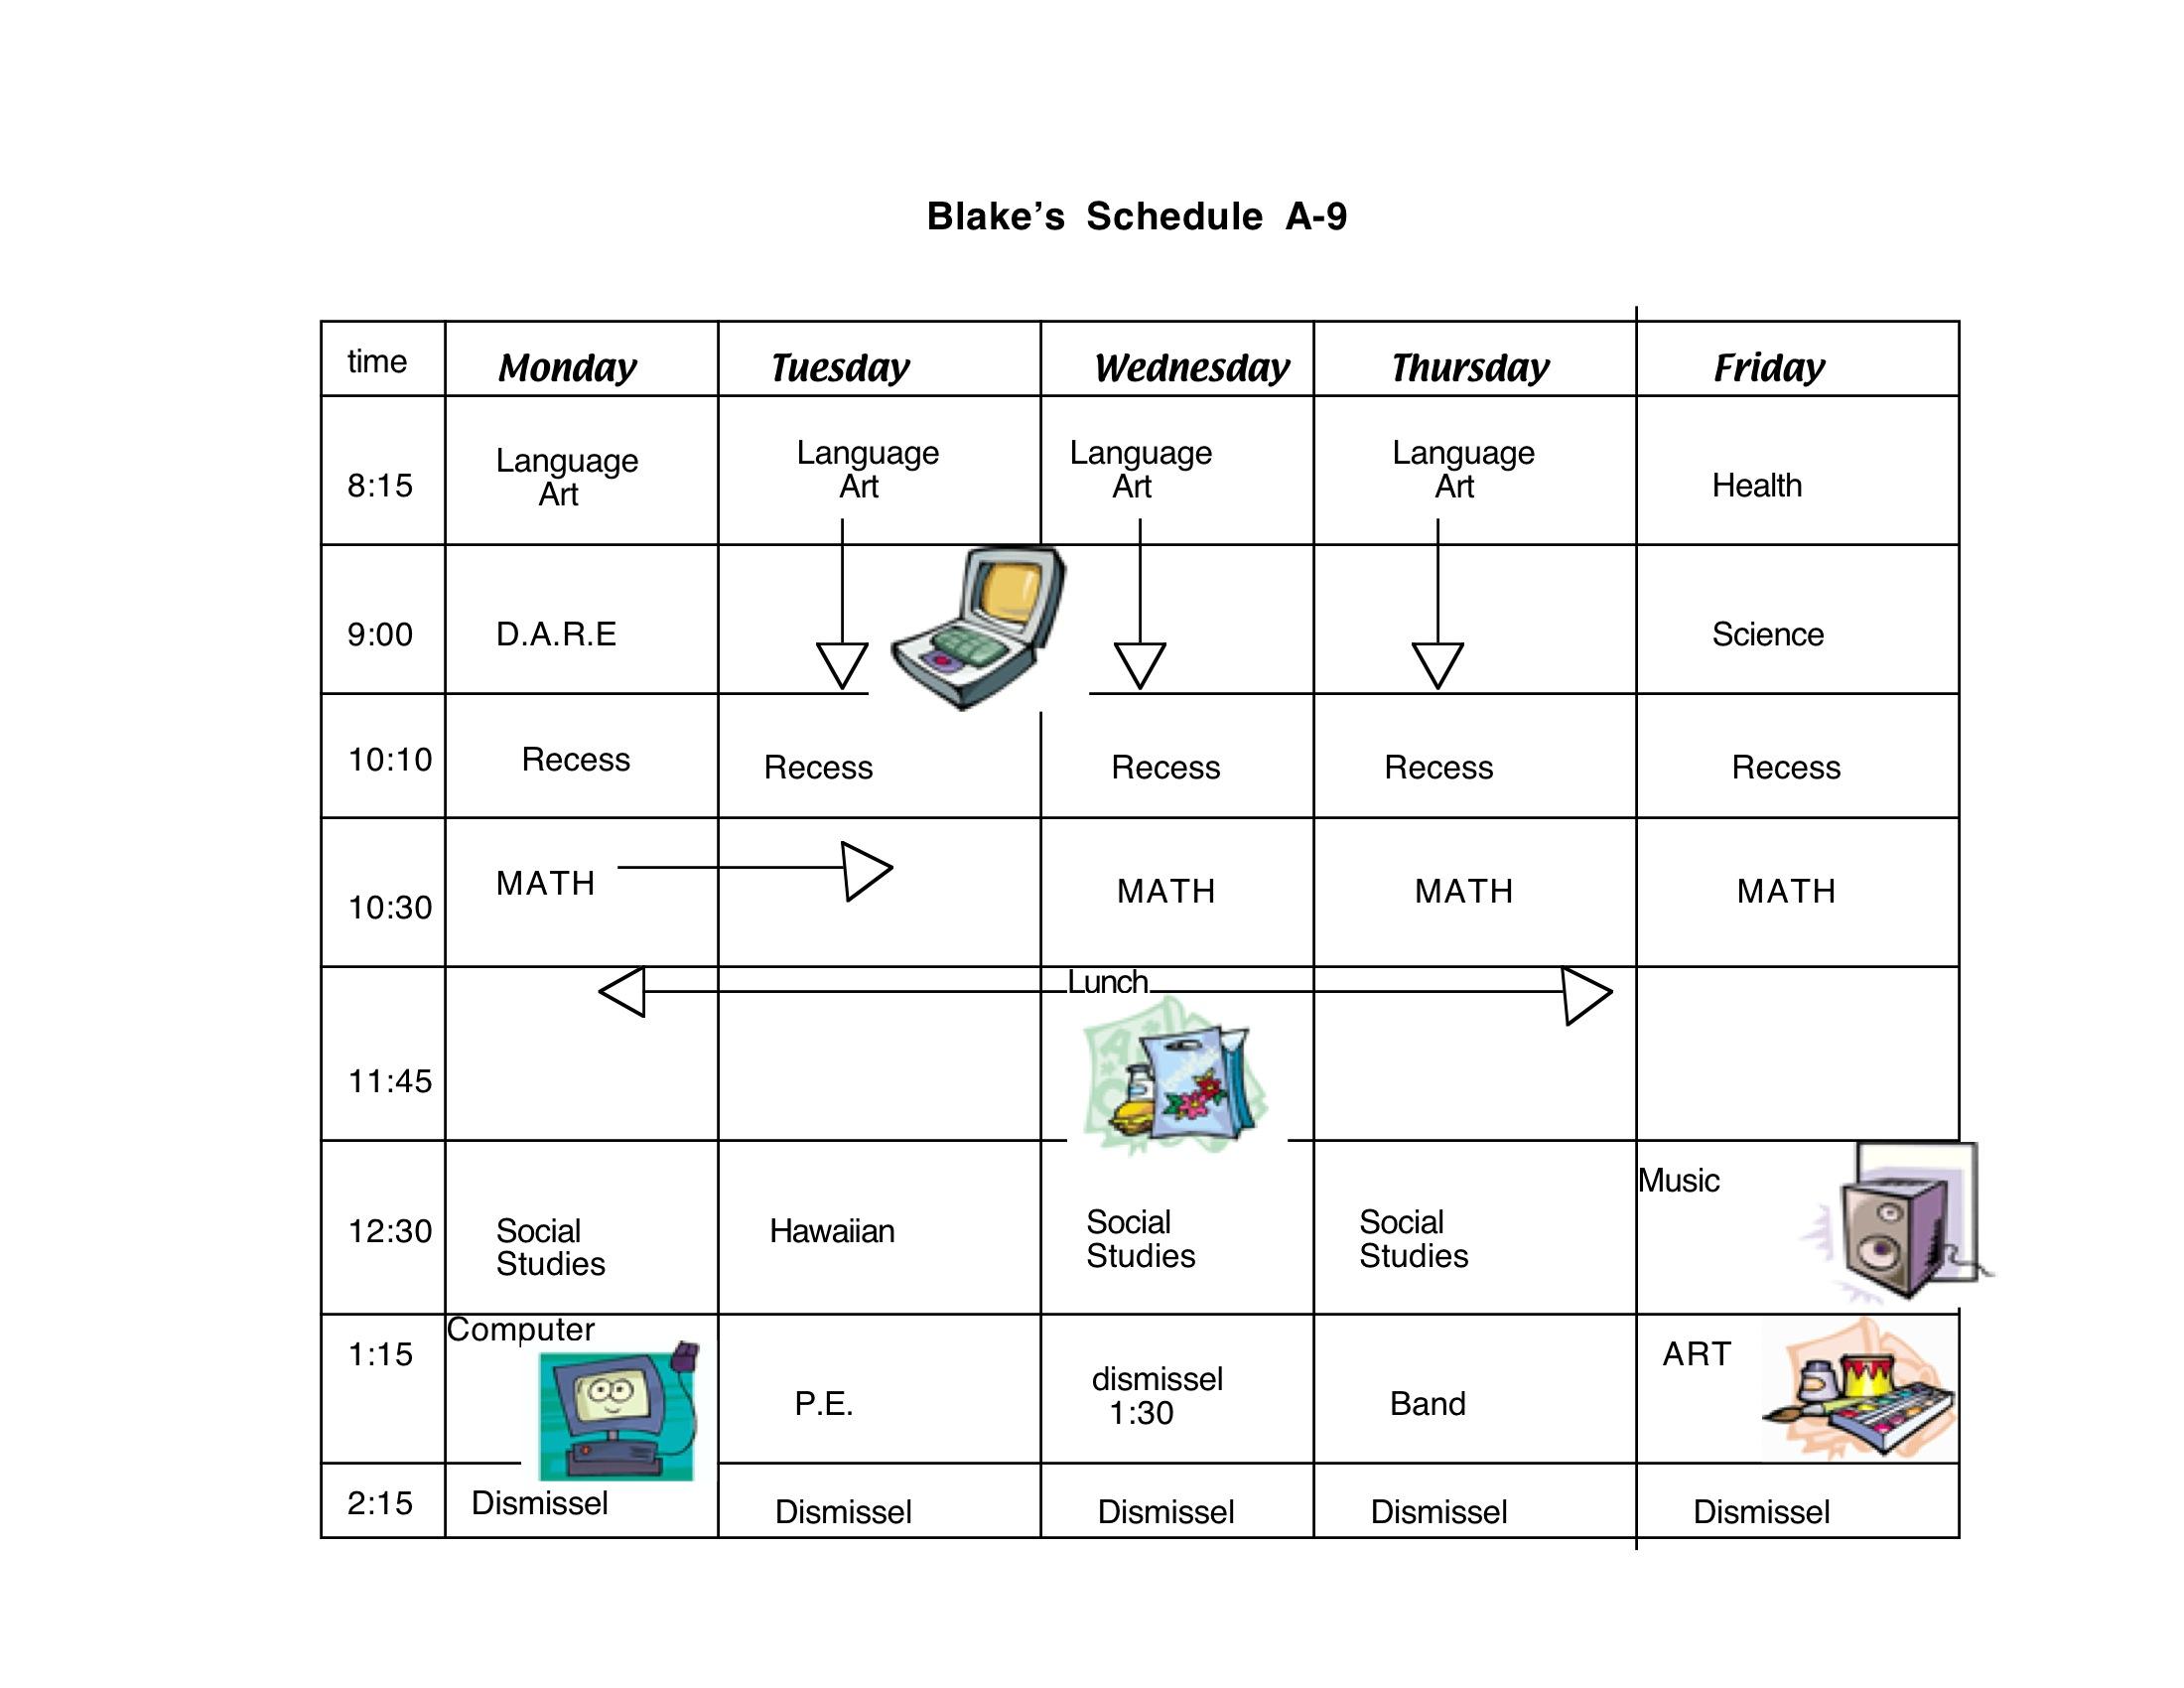 Free Class Schedule Cliparts, Download Free Clip Art, Free Clip Art.